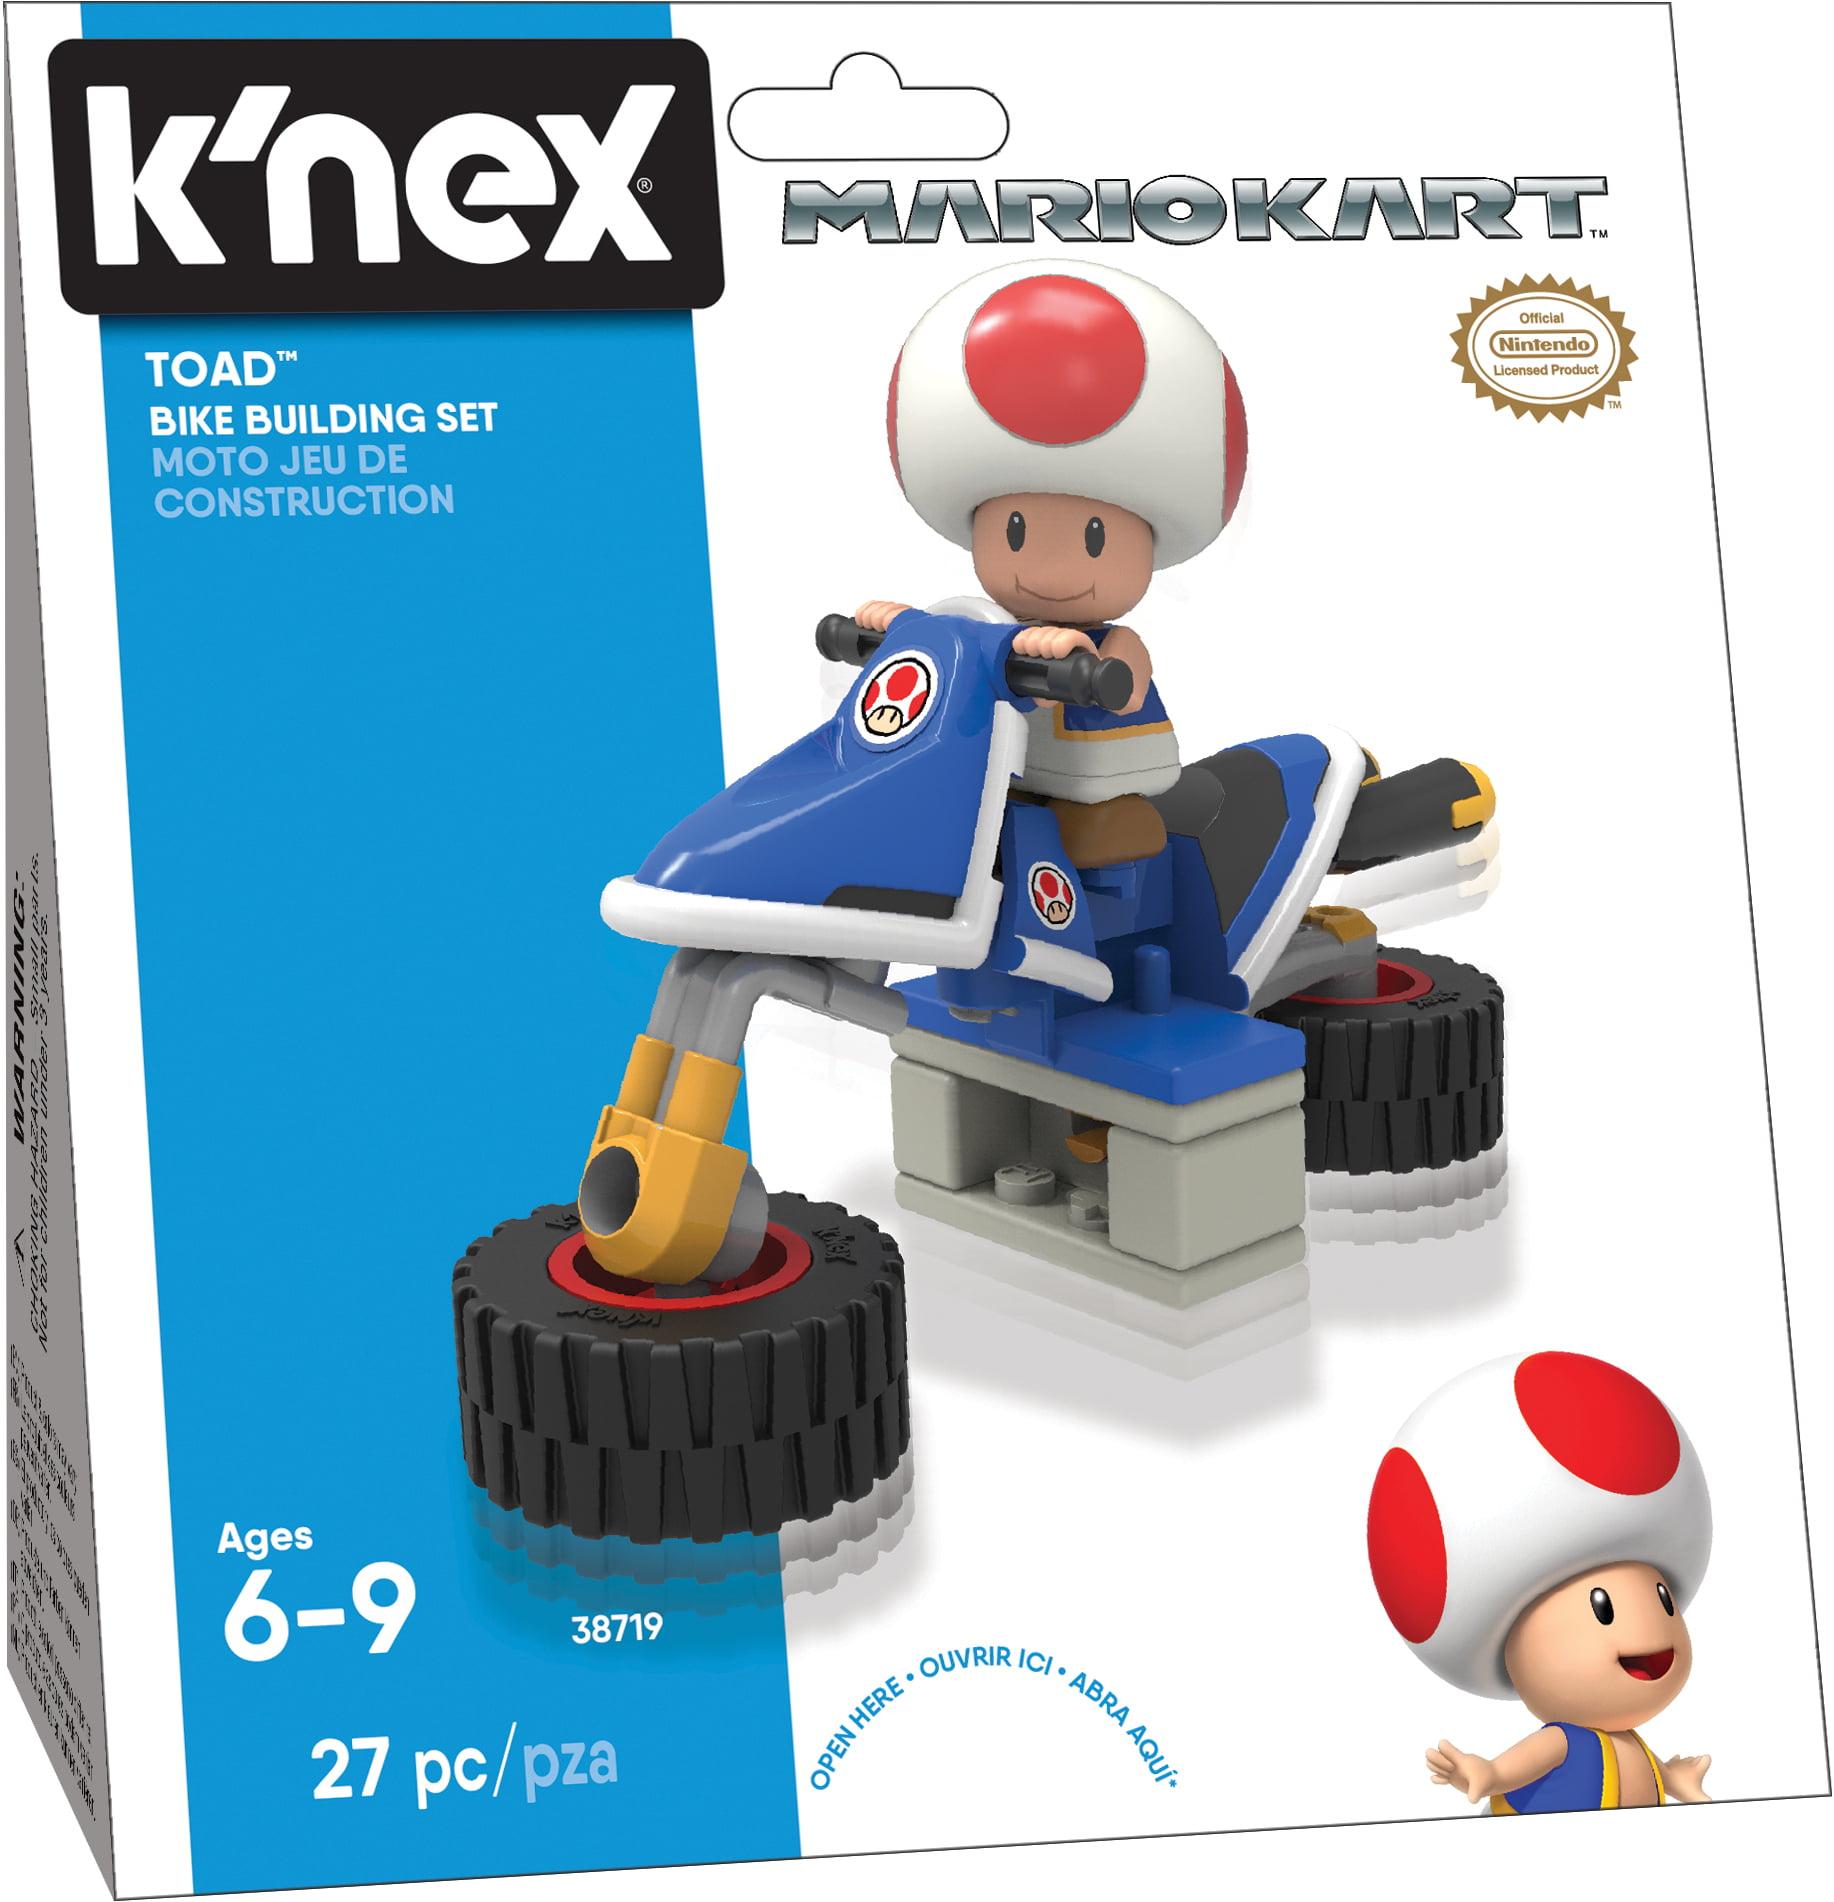 K'NEX Mario Kart Toad Bike Building Set